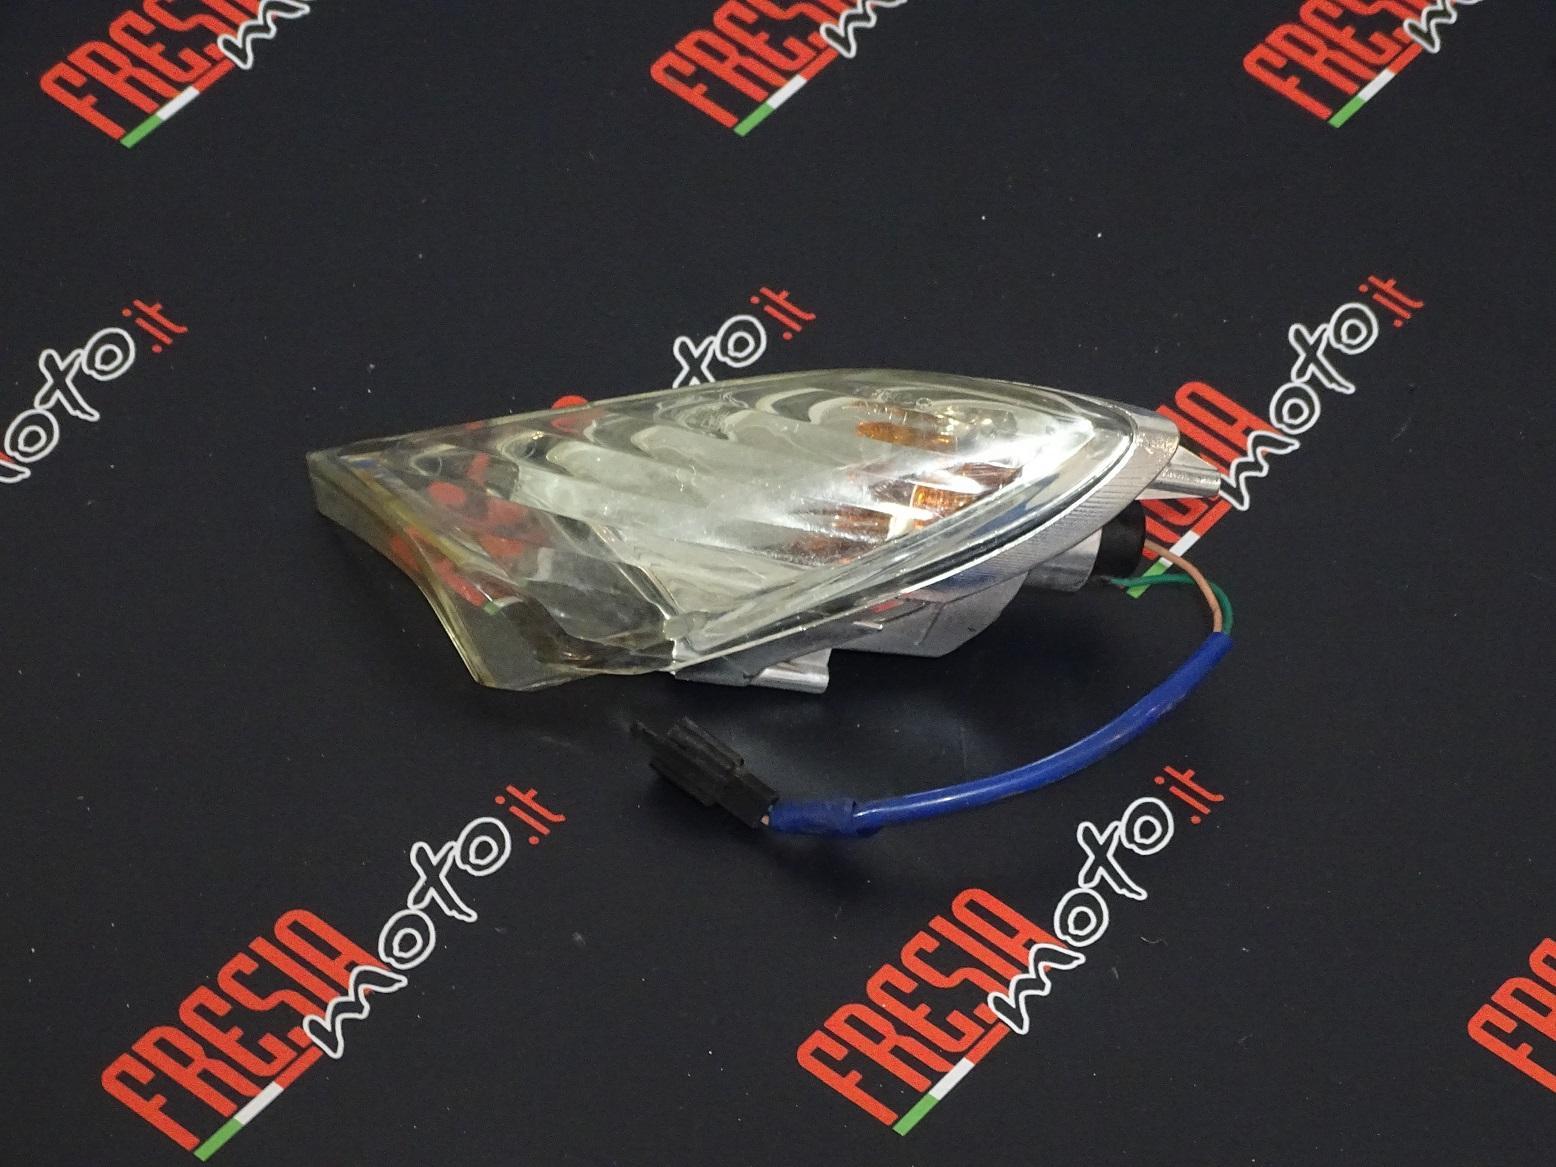 INDICATORE SINISTRO ANTERIORE USATO KYMCO XCITING R 500 ANNO 2008